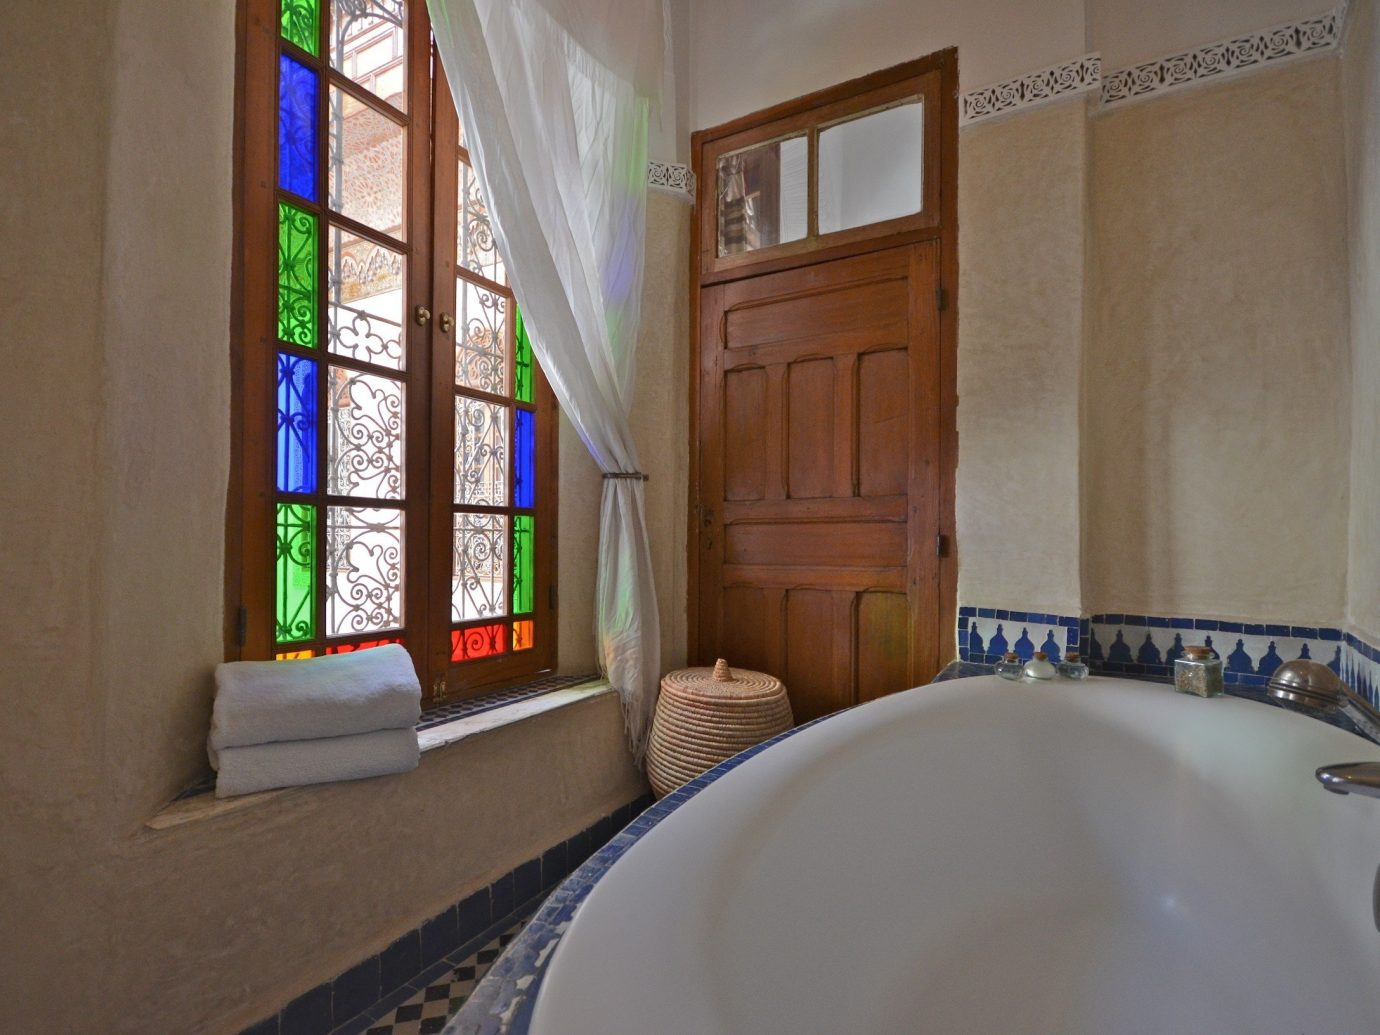 Hotels wall indoor bathroom room property house home estate floor tub interior design sink cottage window real estate Design apartment mansion bathtub Bath